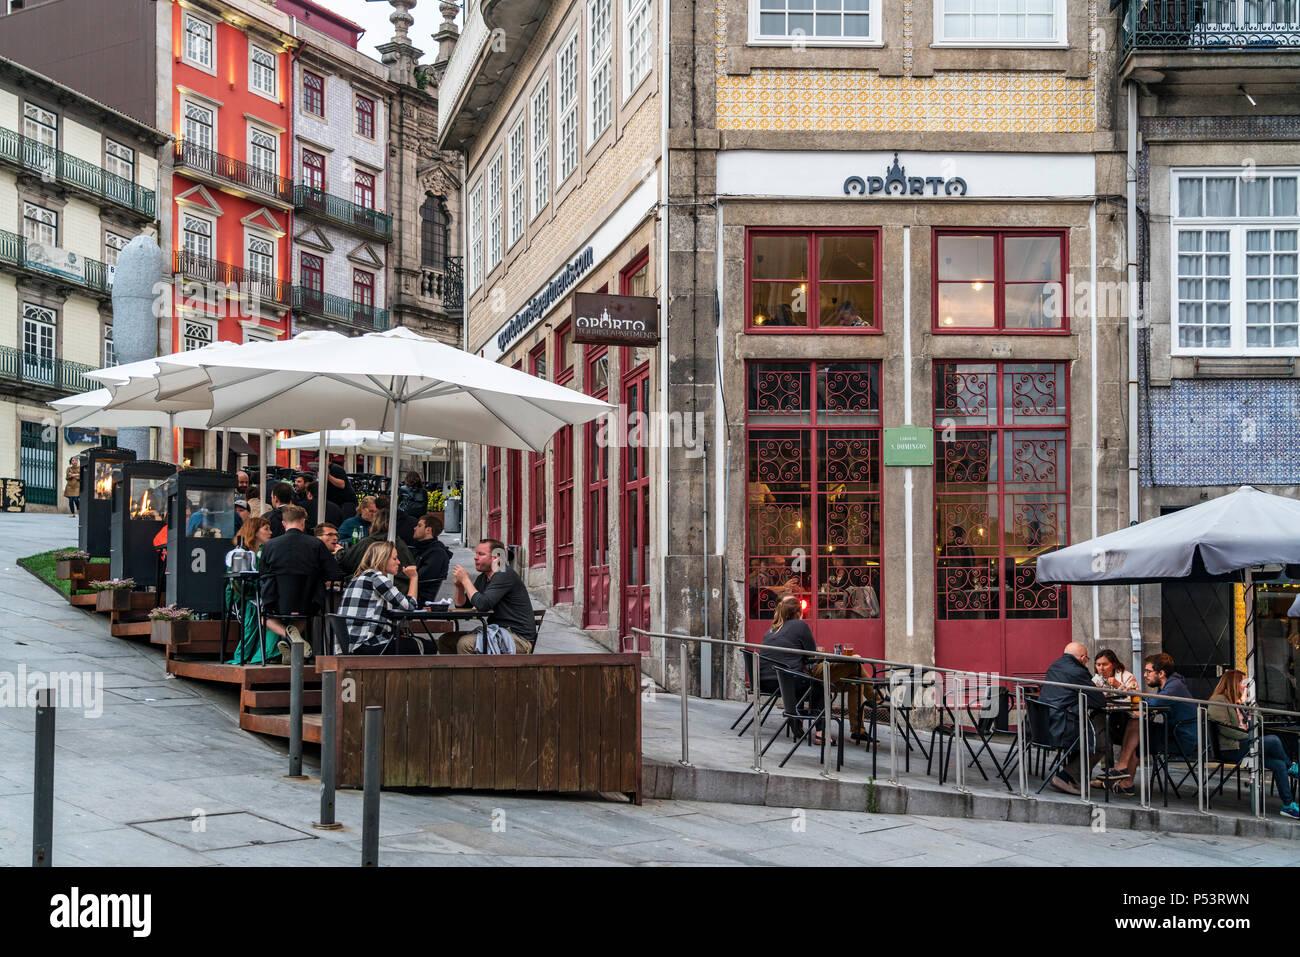 Restaurants and street cafes, Largo Sao Domingos, Oporto Appartments, Porto, Portugal - Stock Image